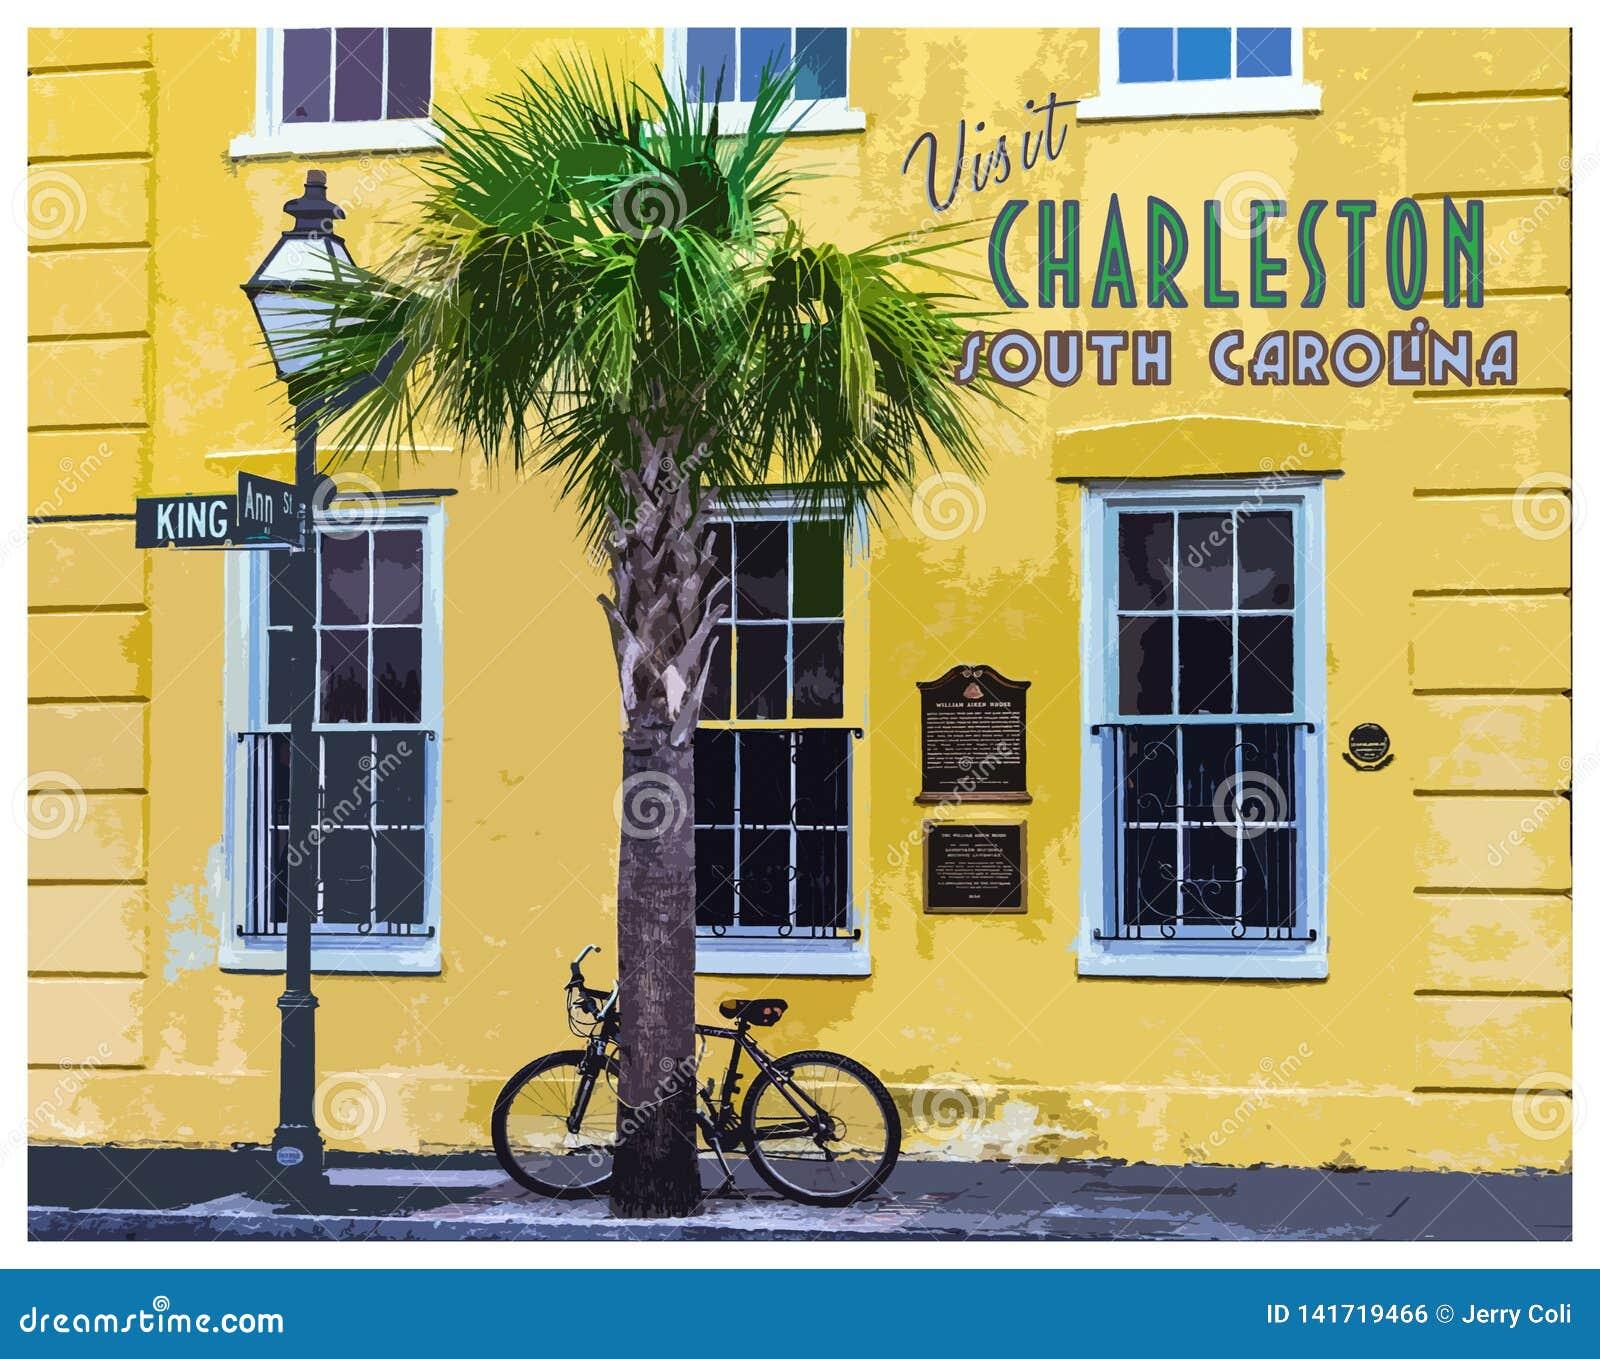 King St Charleston Sc: Visit Charleston, South Carolina Retro Poster Editorial